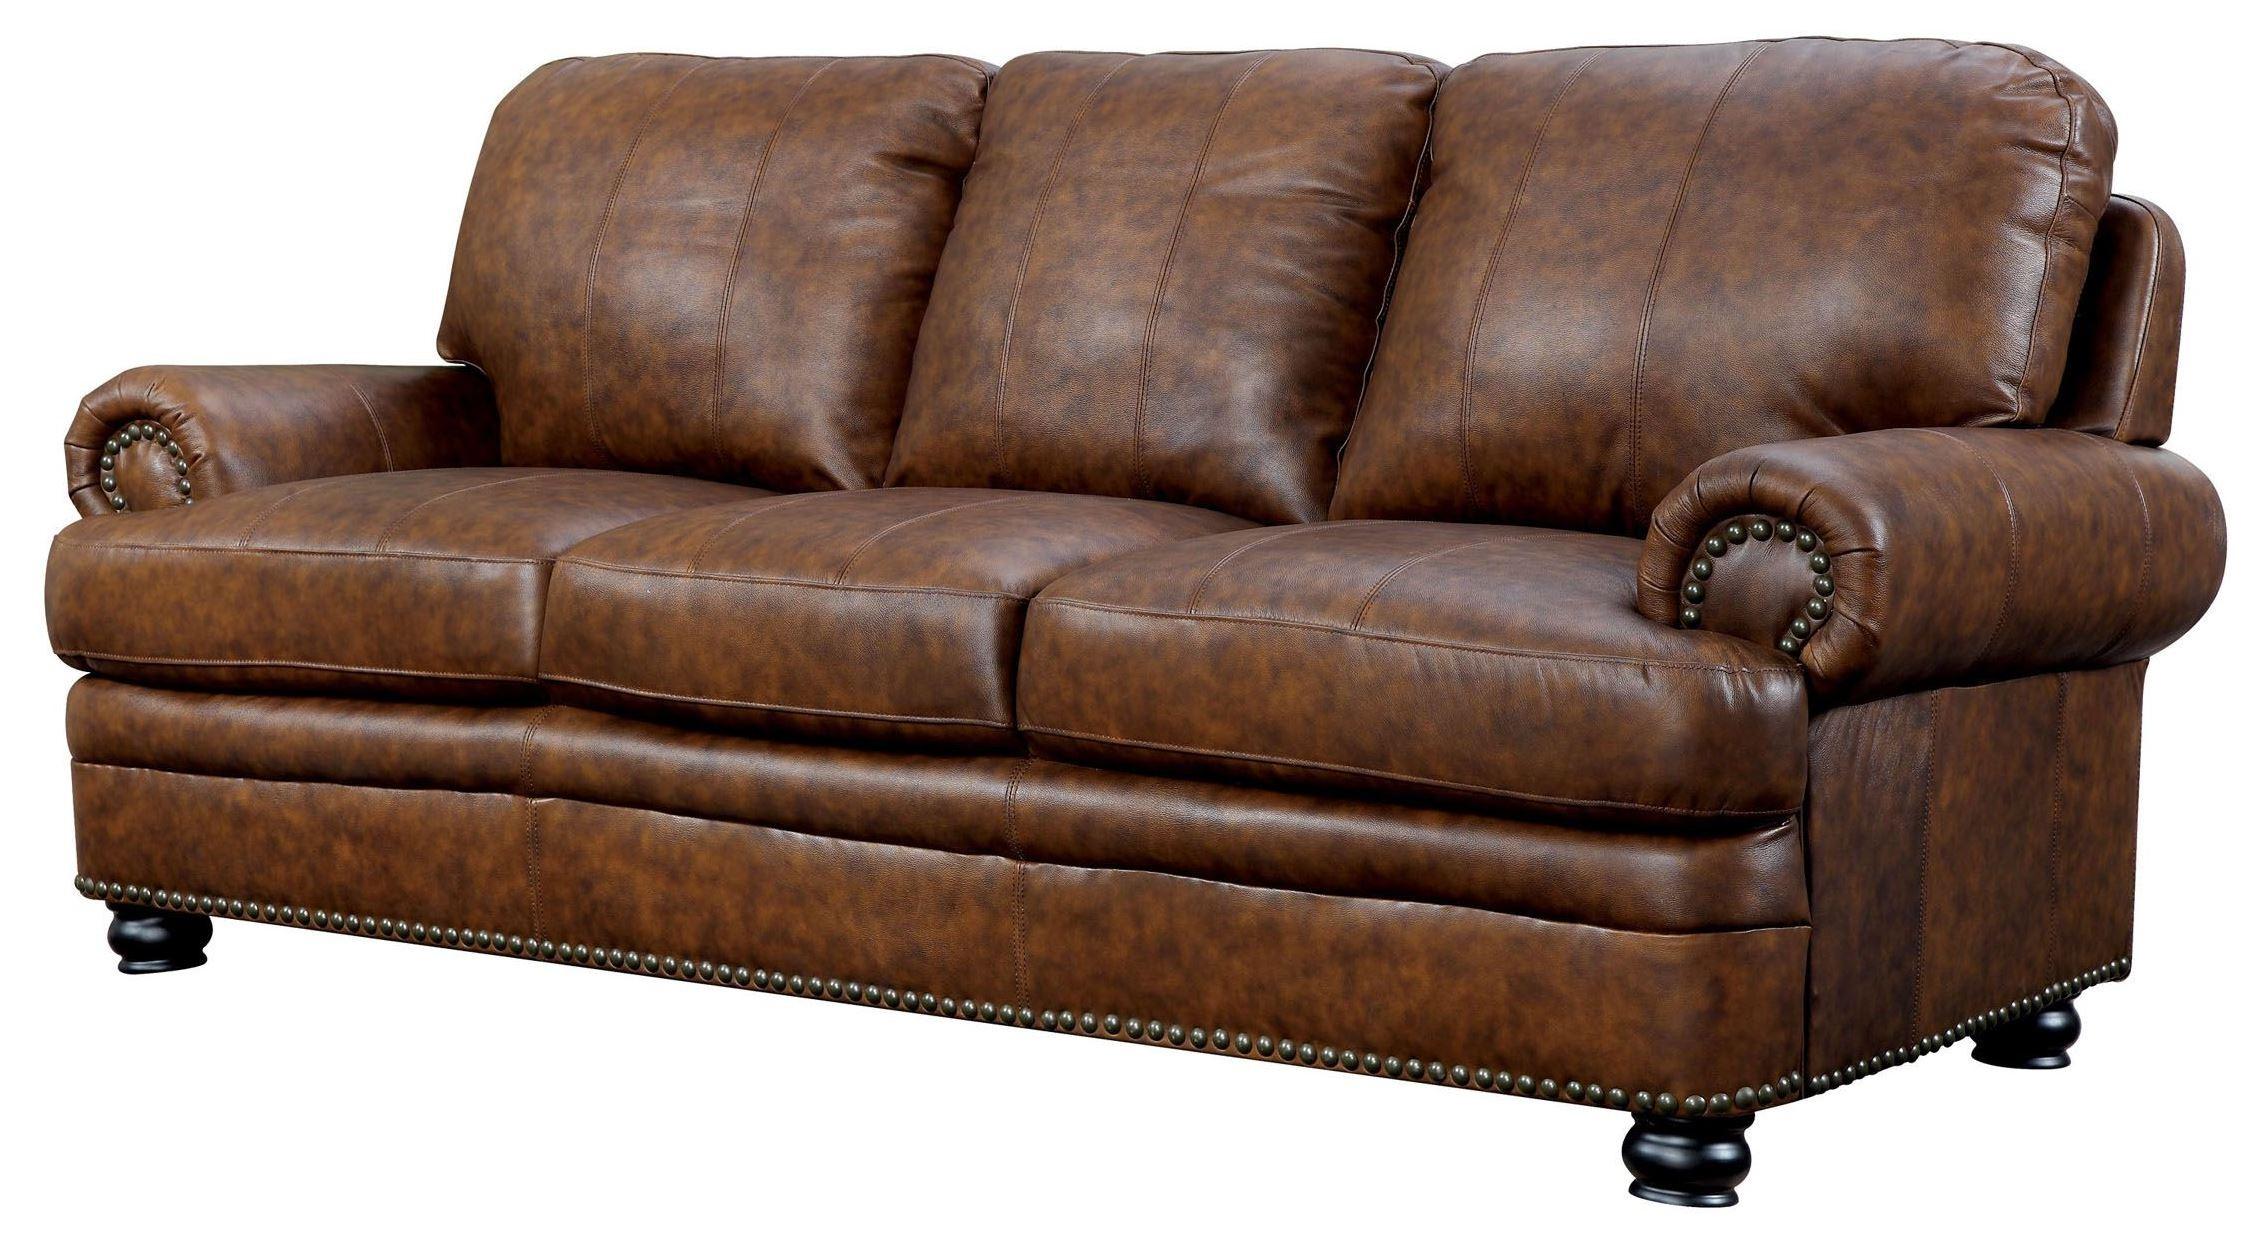 Living Room Furniture: Rheinhardt Top Grain Leather Living Room Set From